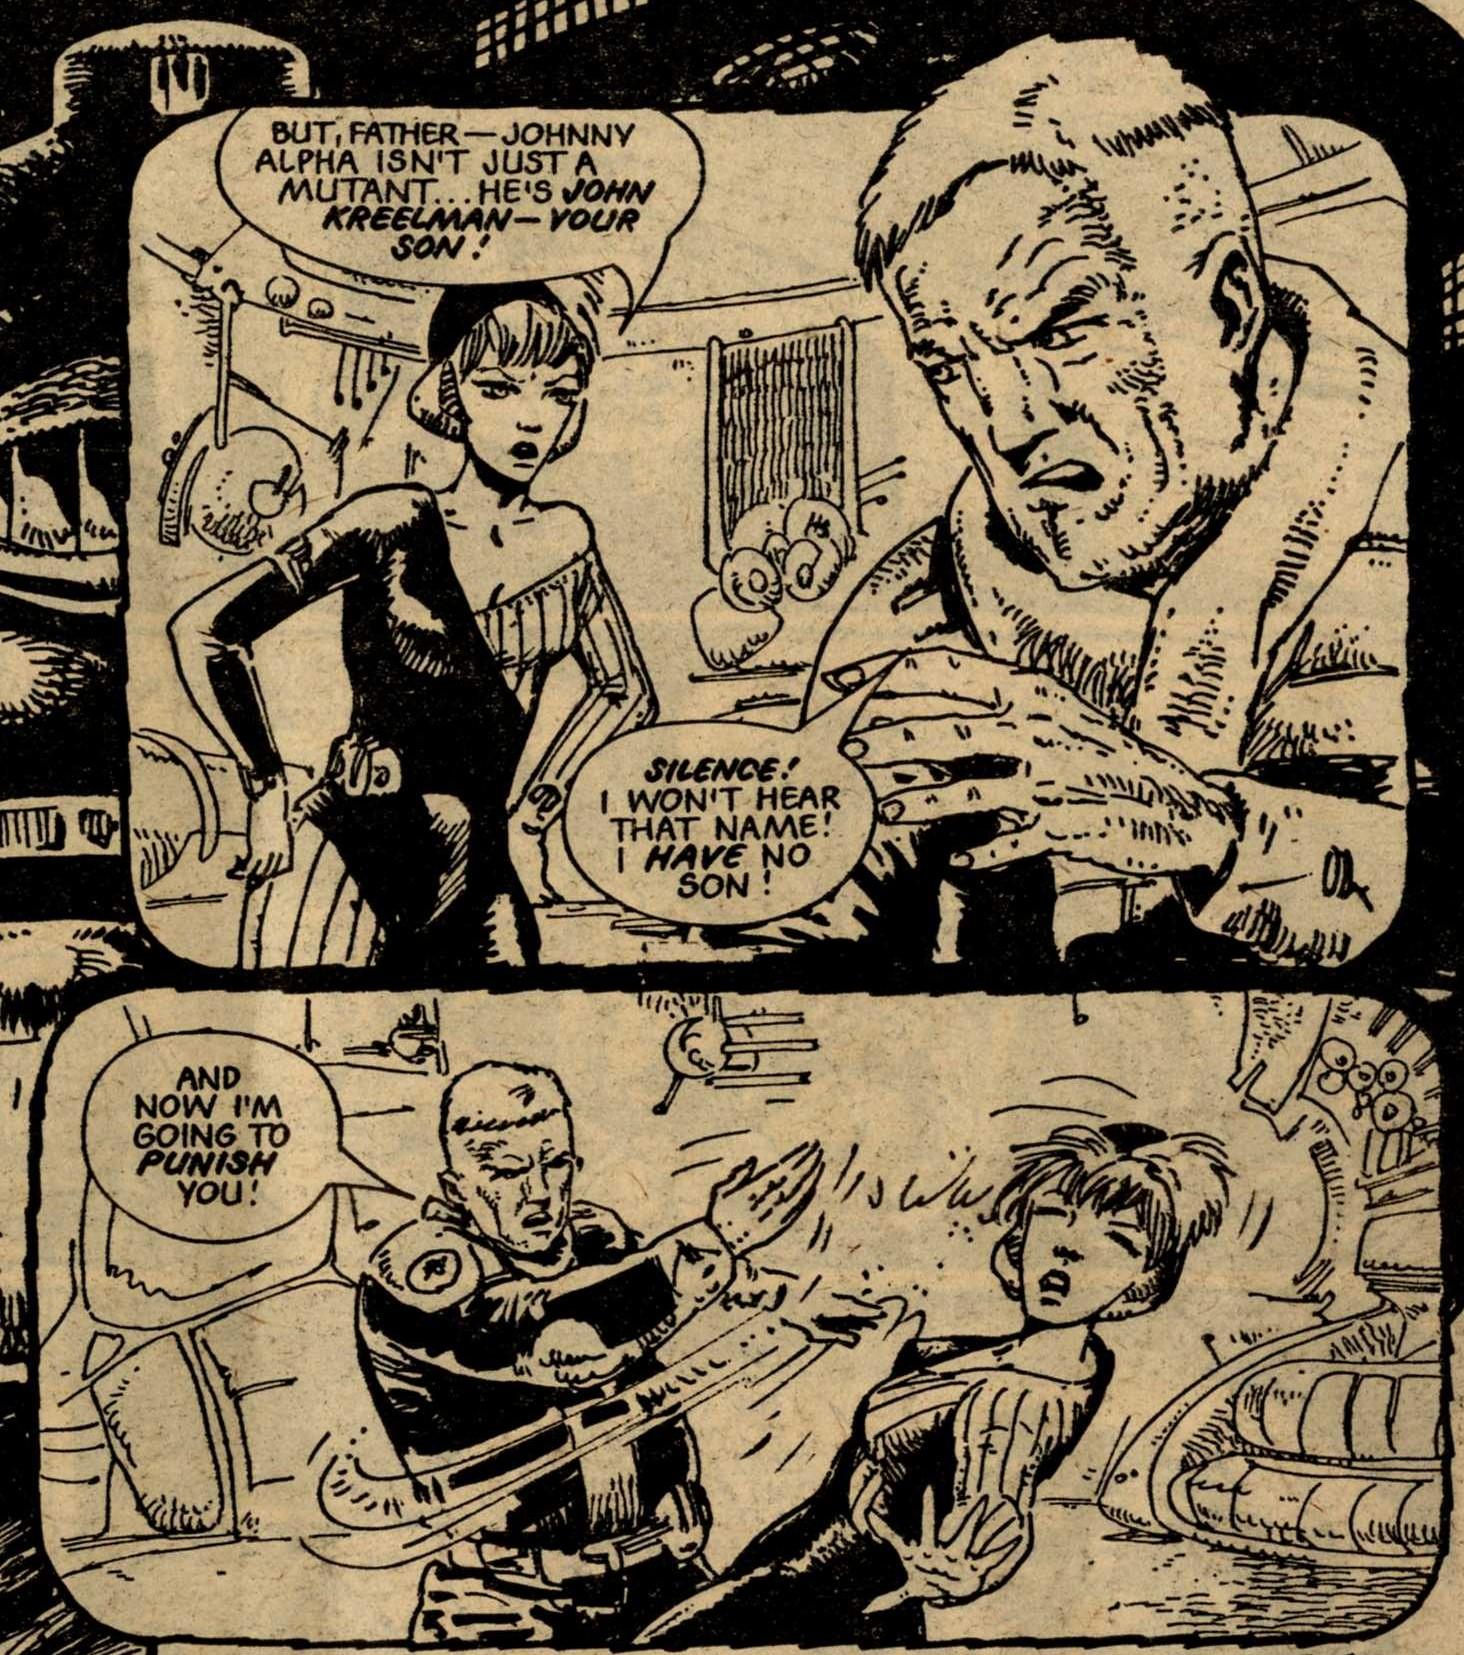 Nelson Bunker Kreelman, drawn by Carlos Ezquerra